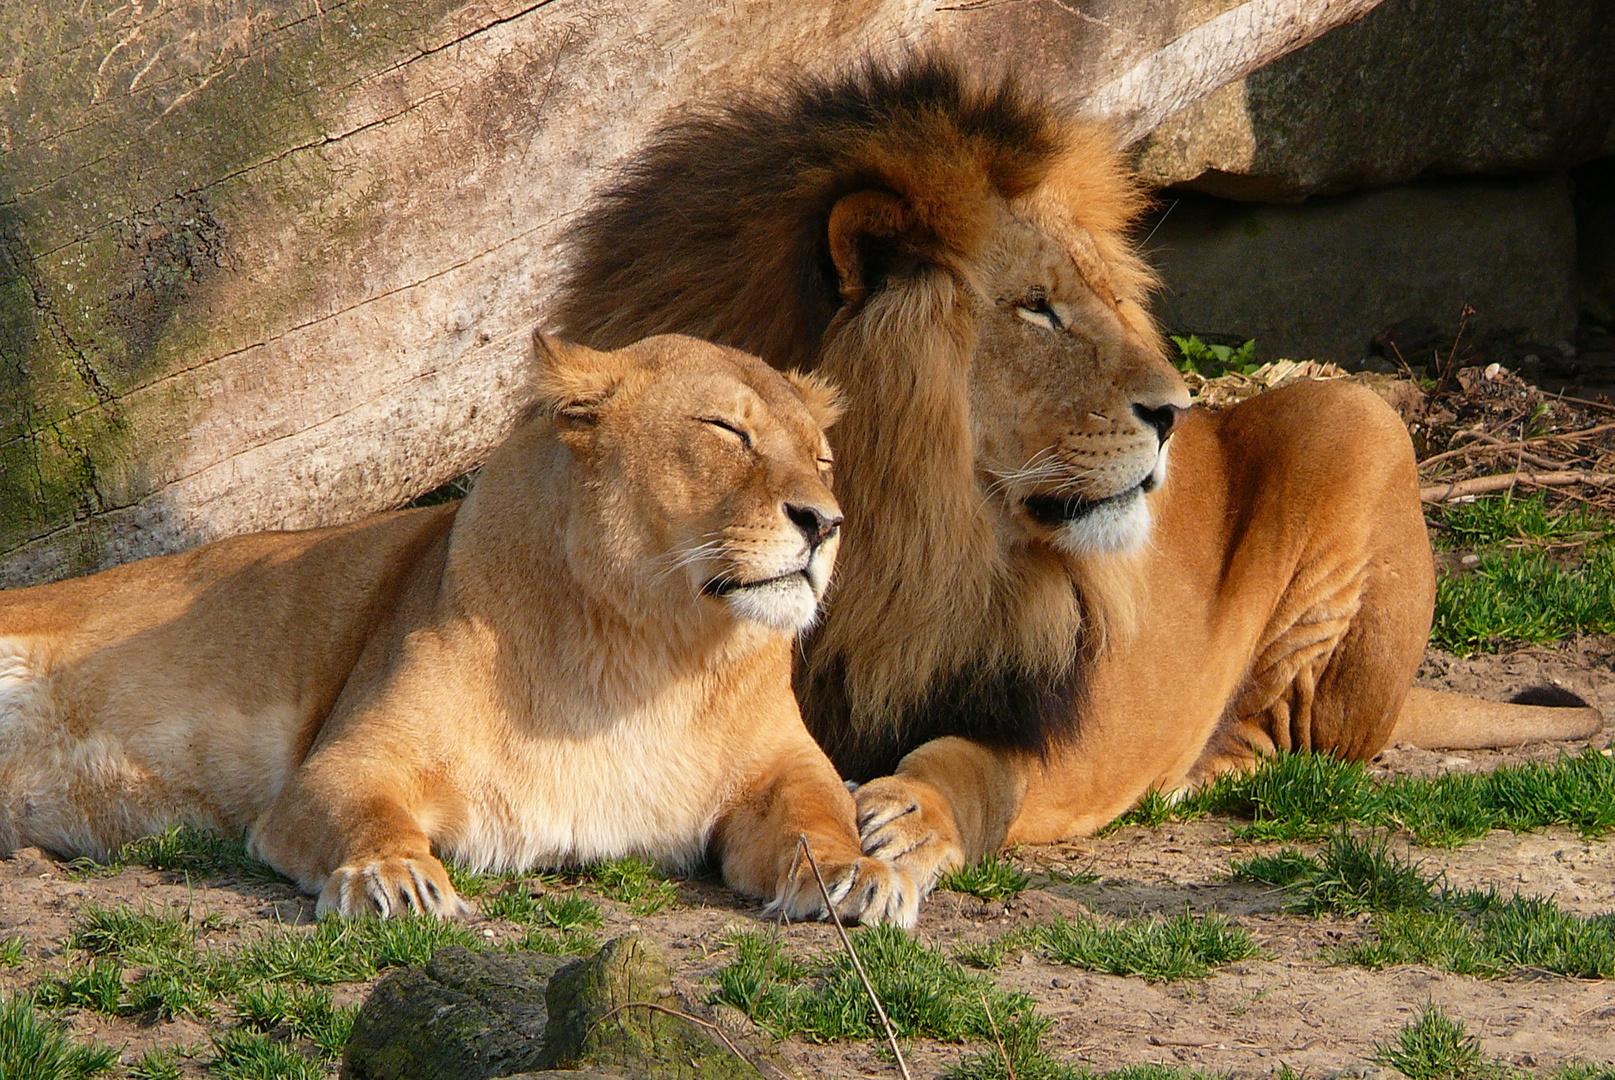 verliebtes Löwenpaar